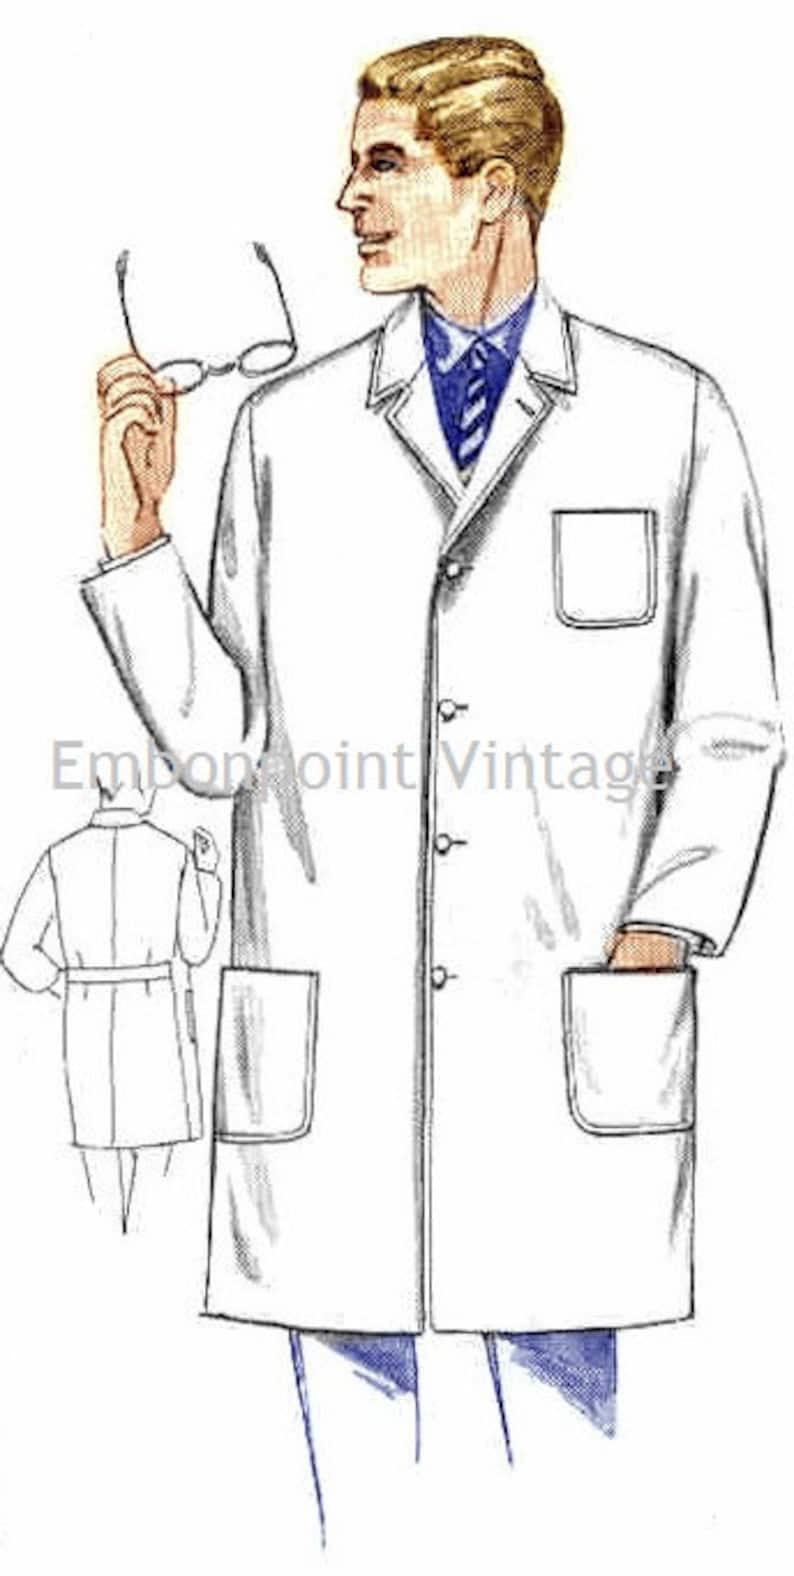 1950s Sewing Patterns | Dresses, Skirts, Tops, Mens Plus Size (or any size) Vintage 1969 Mens Lab Coat Pattern - PDF - Pattern No 148 Bradley 1960s 60s $9.50 AT vintagedancer.com